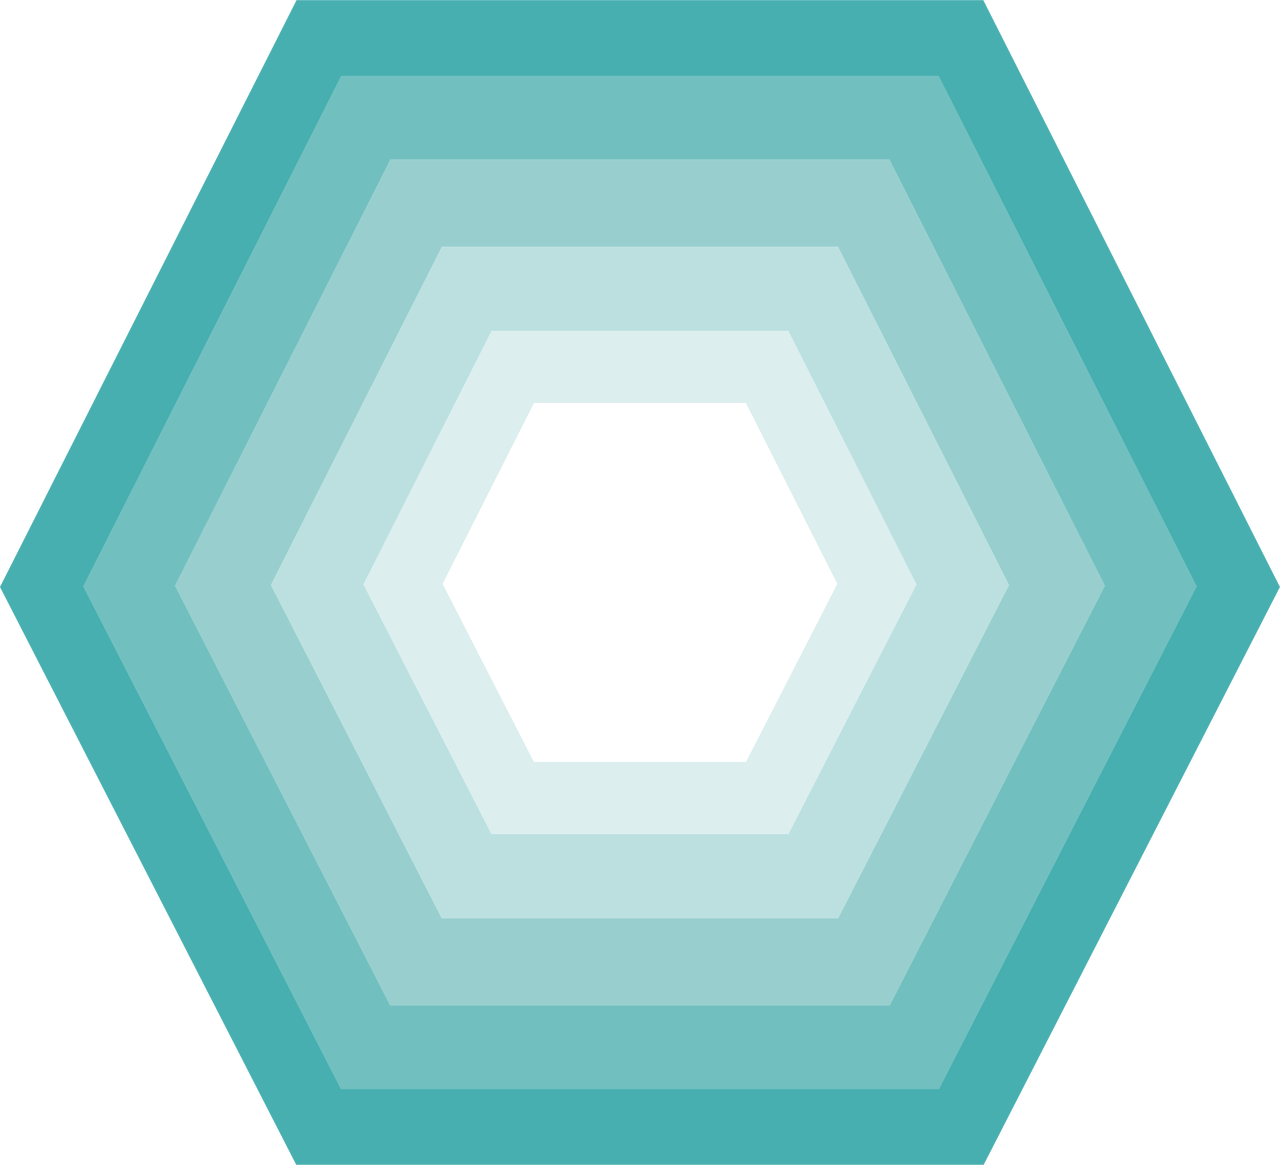 Hexagon Nesting Shape SVG Cut File